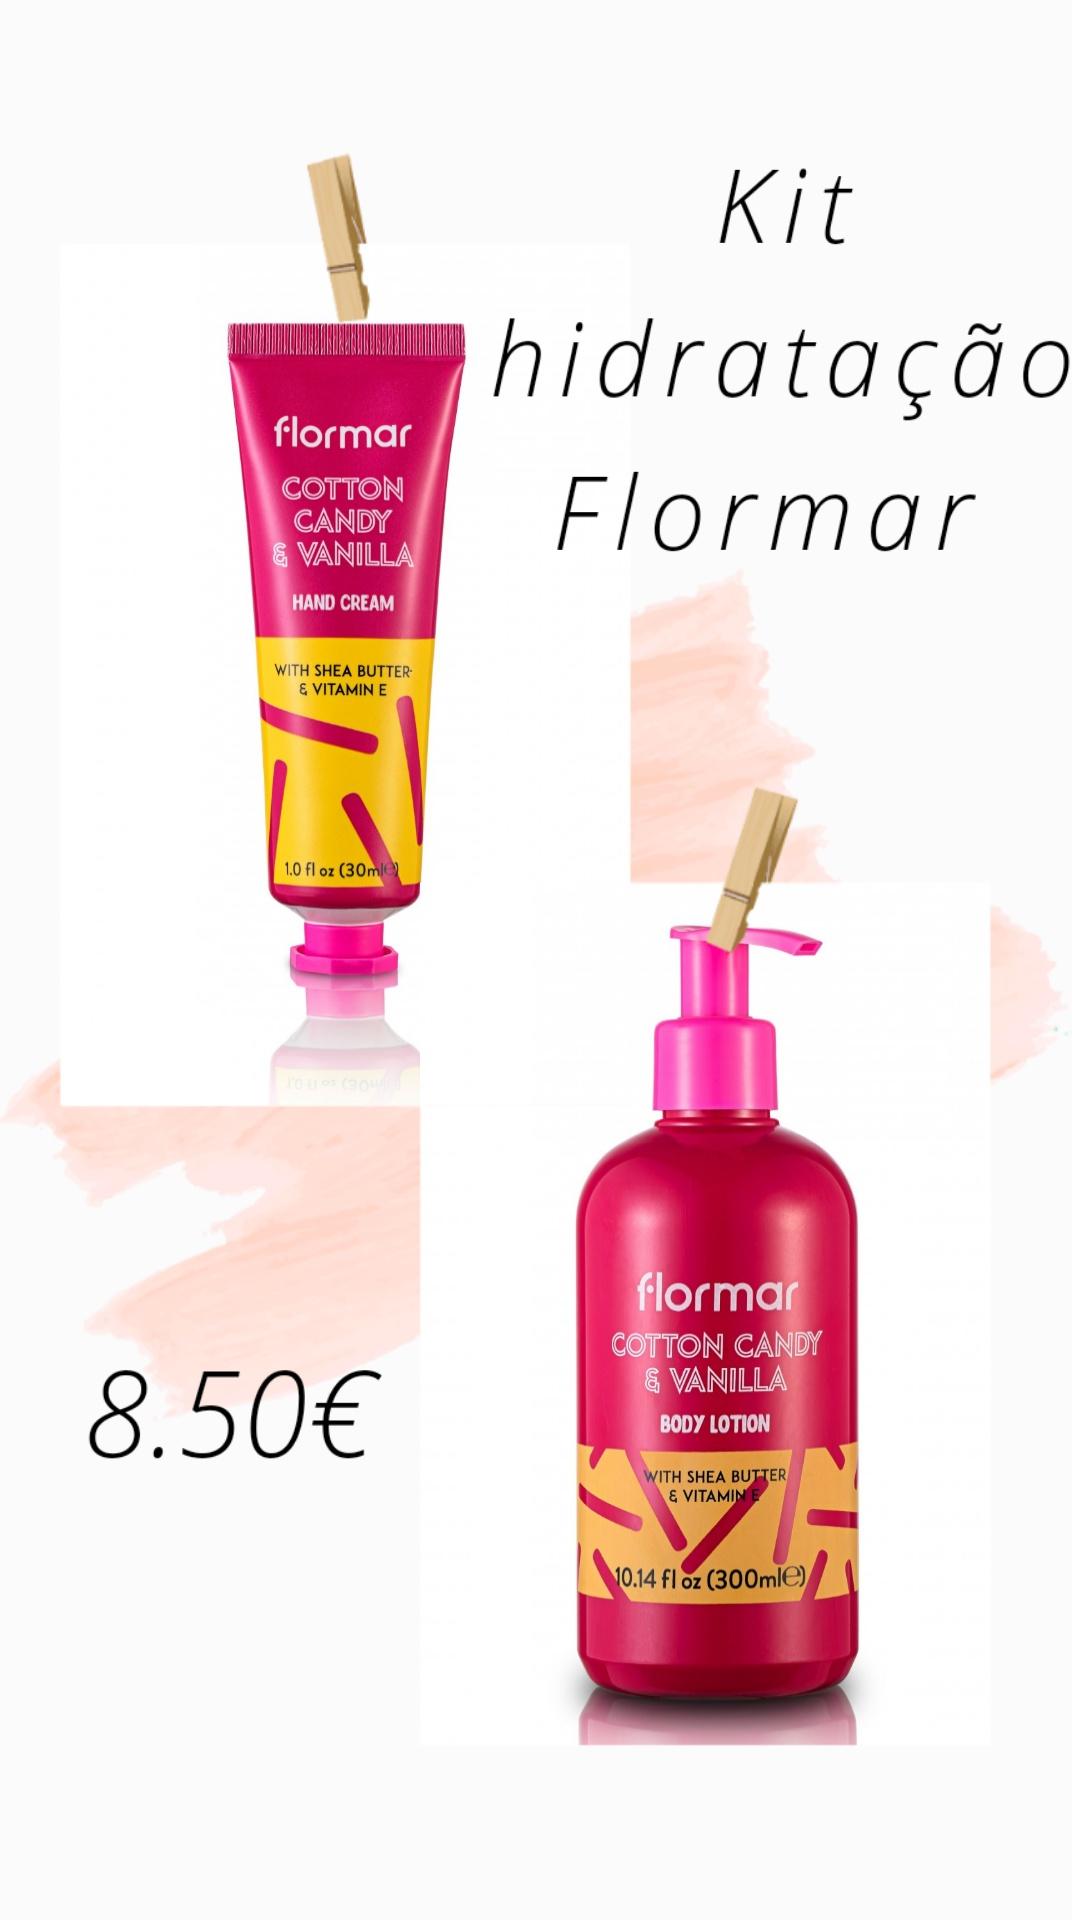 FLORMAR - Kit Hidratação - COTTON CANDY & VANILLA